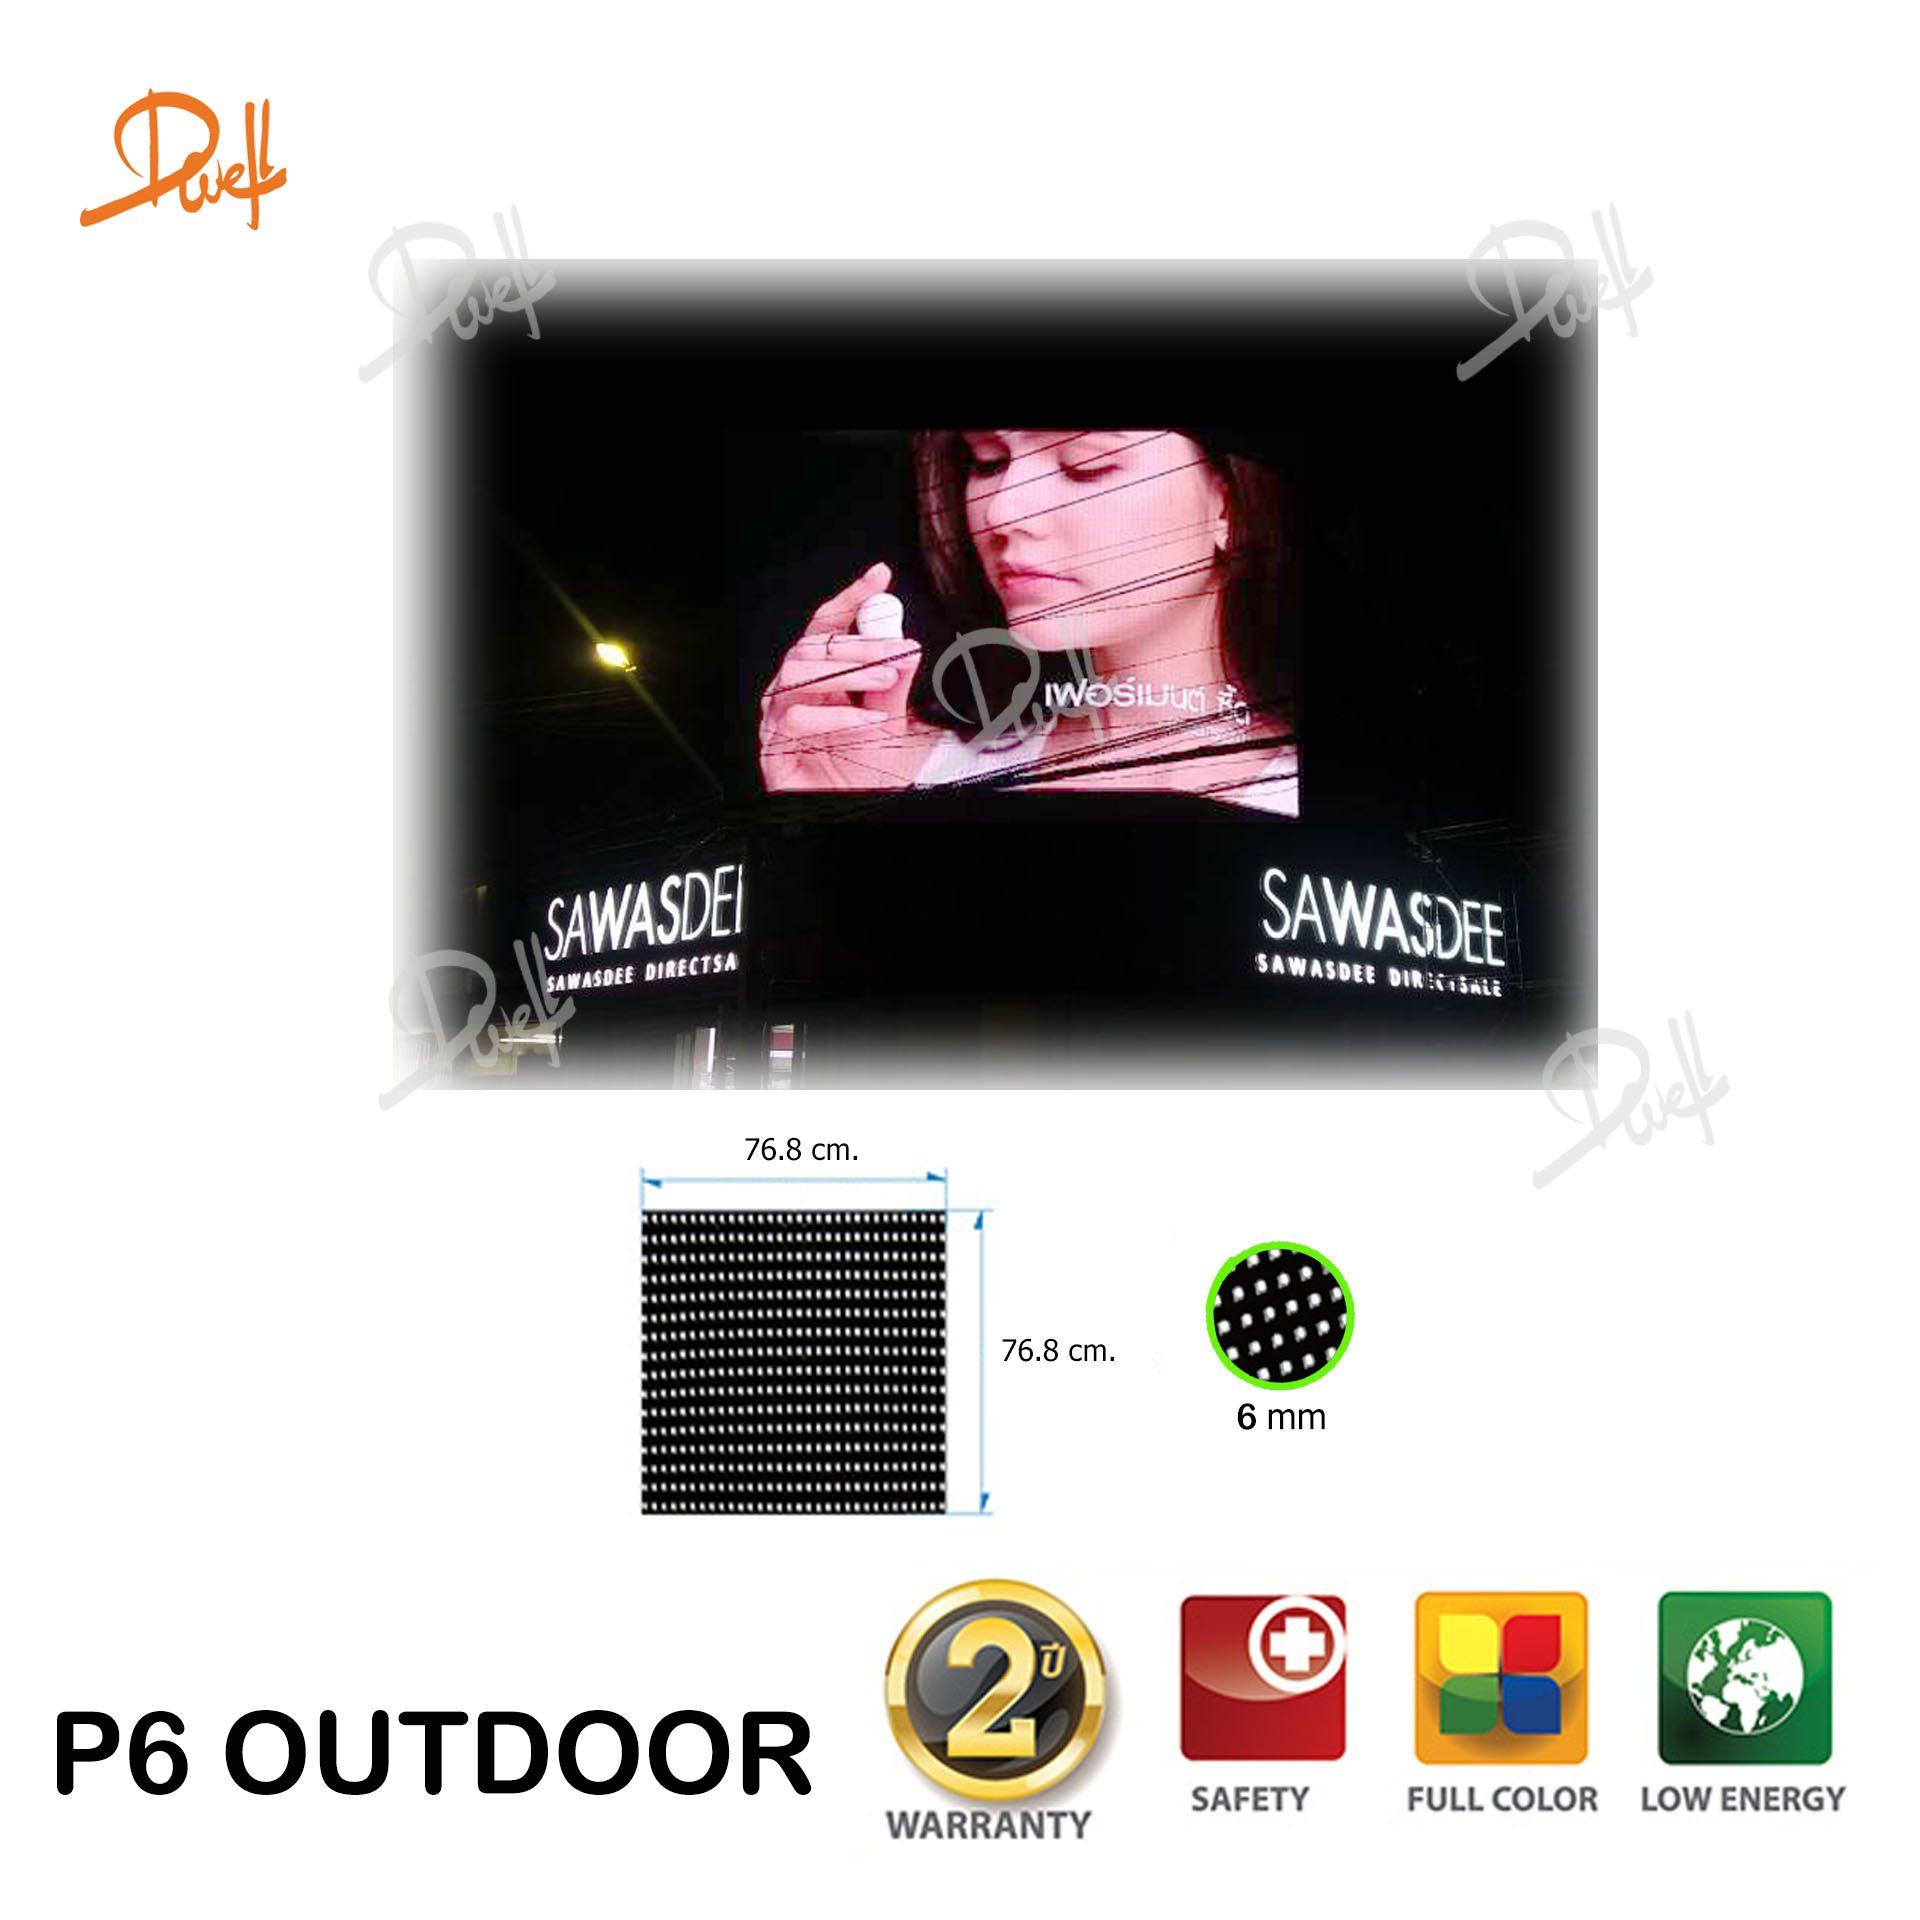 LED Display จอทีวีขนาดใหญ่ LED Full Color Outdoor P6